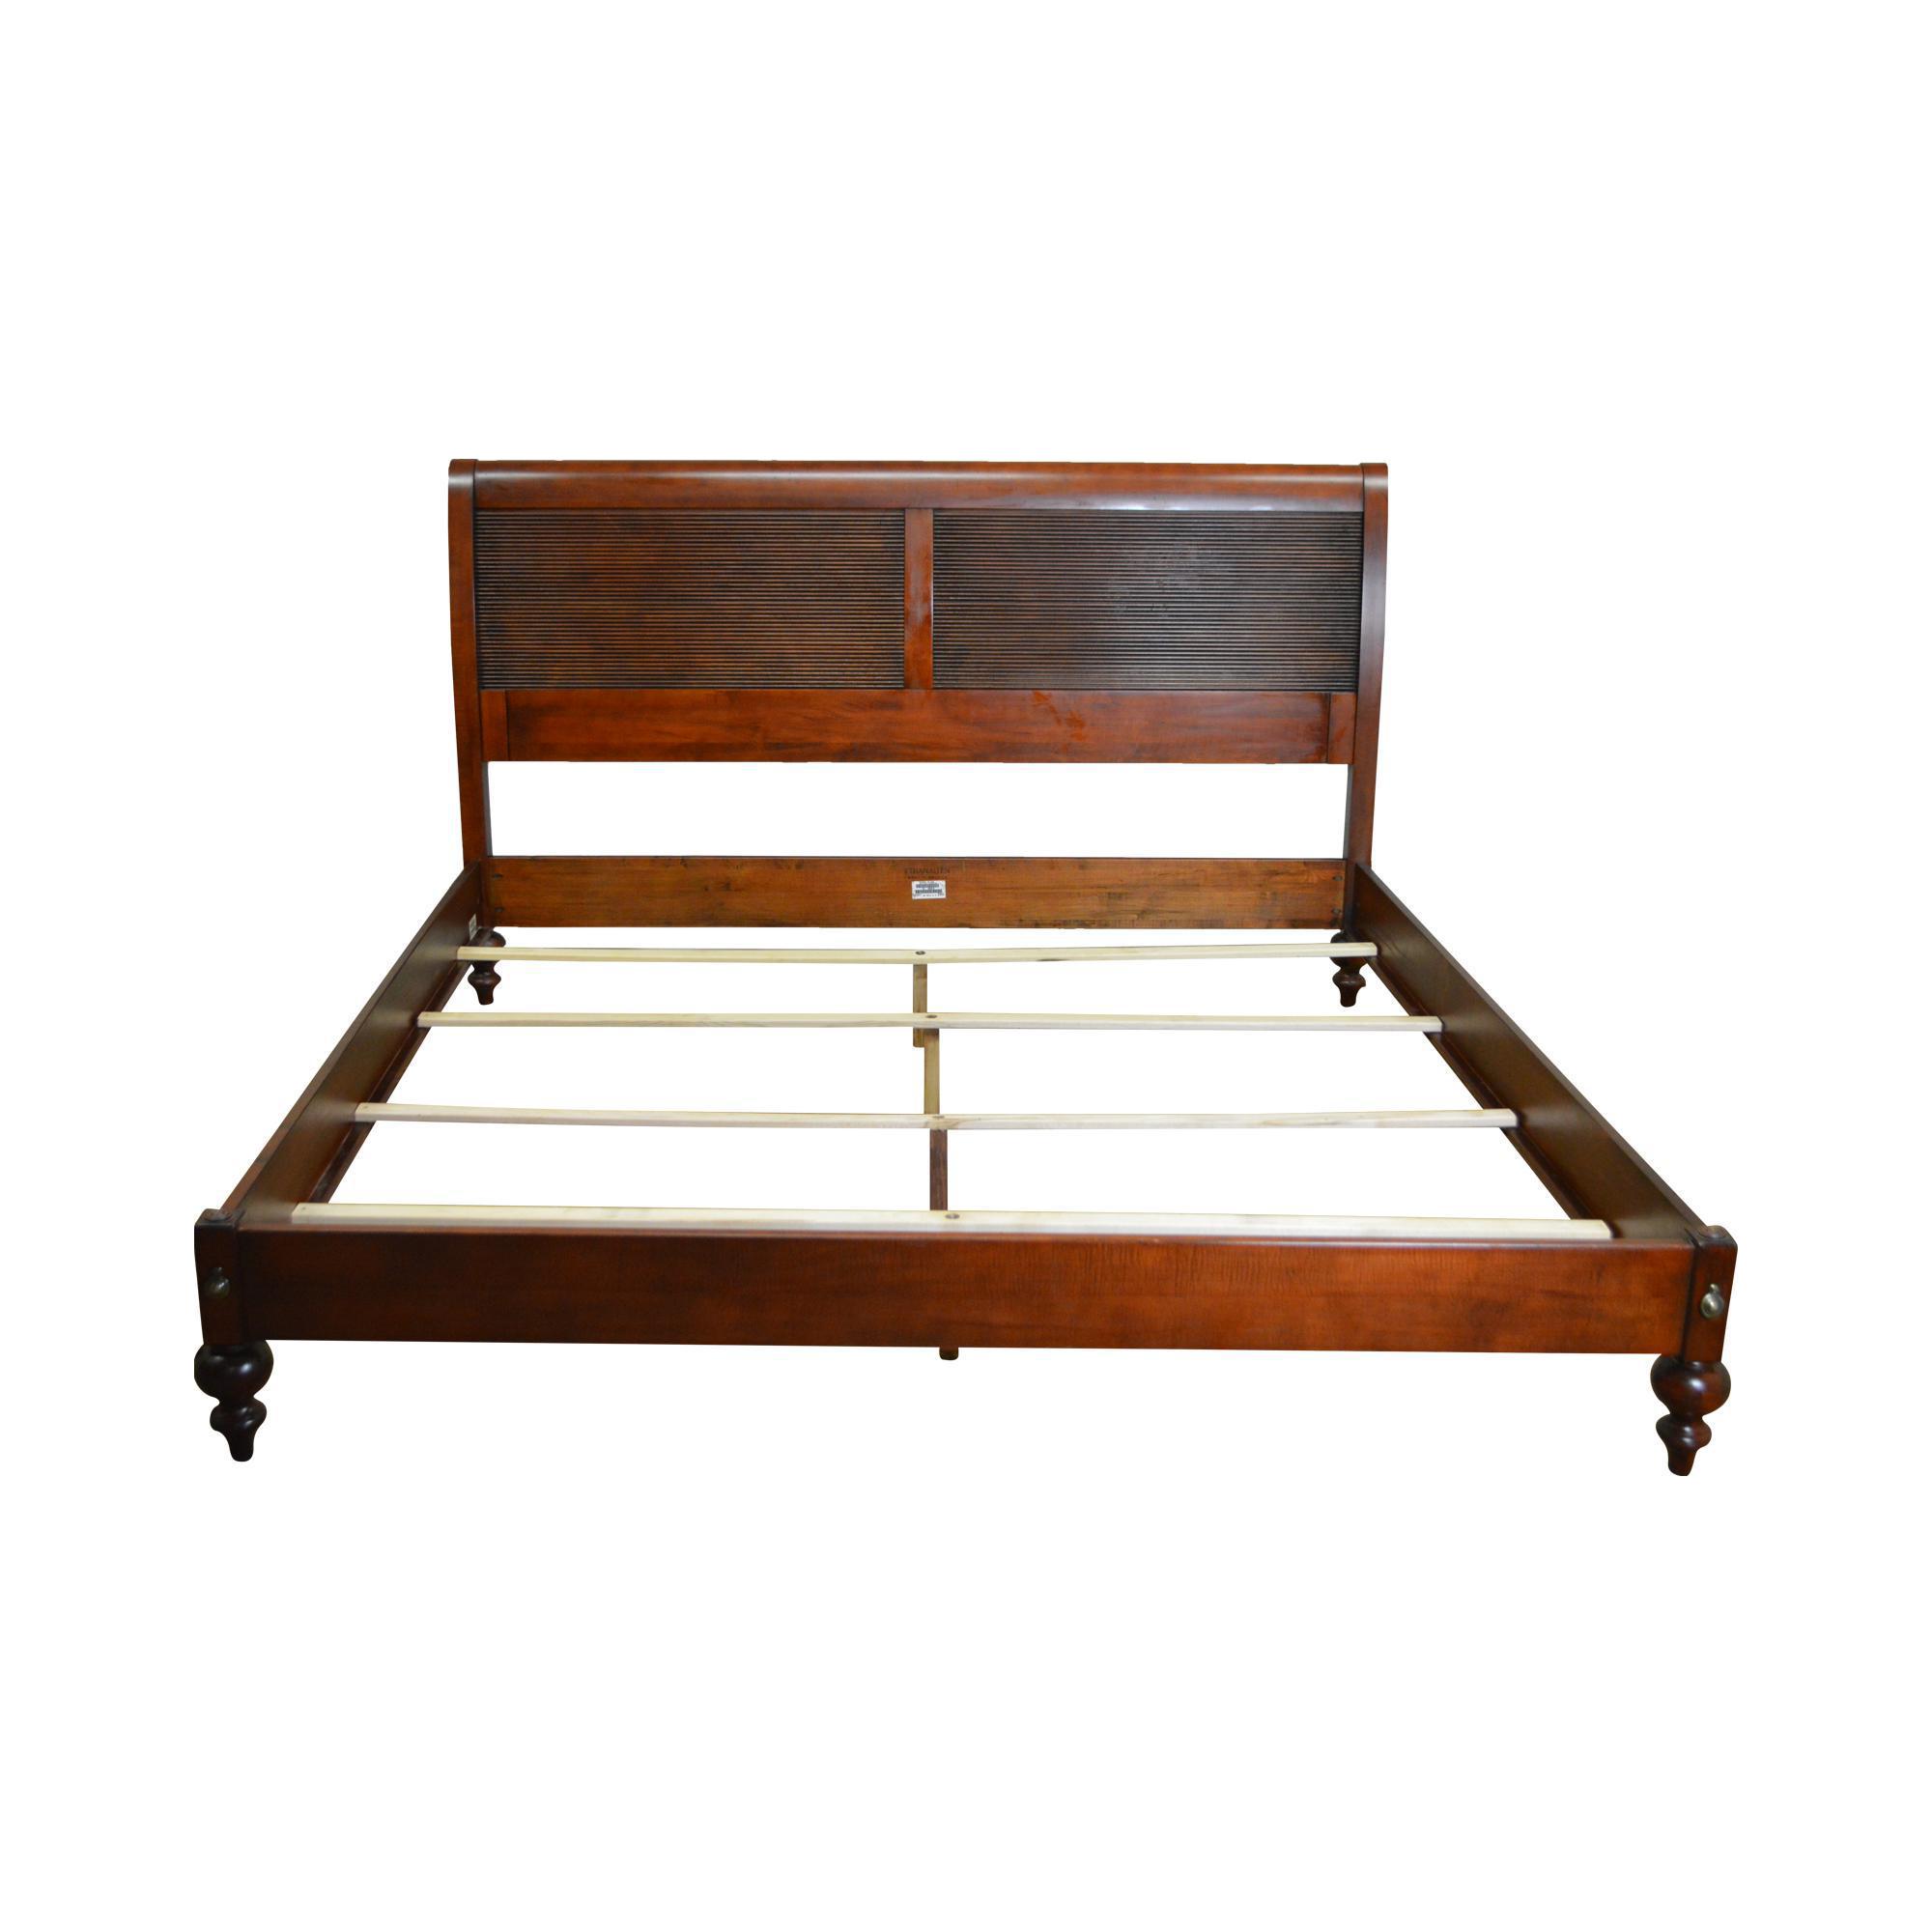 Ethan Allen British Classics King Size Bed Chairish